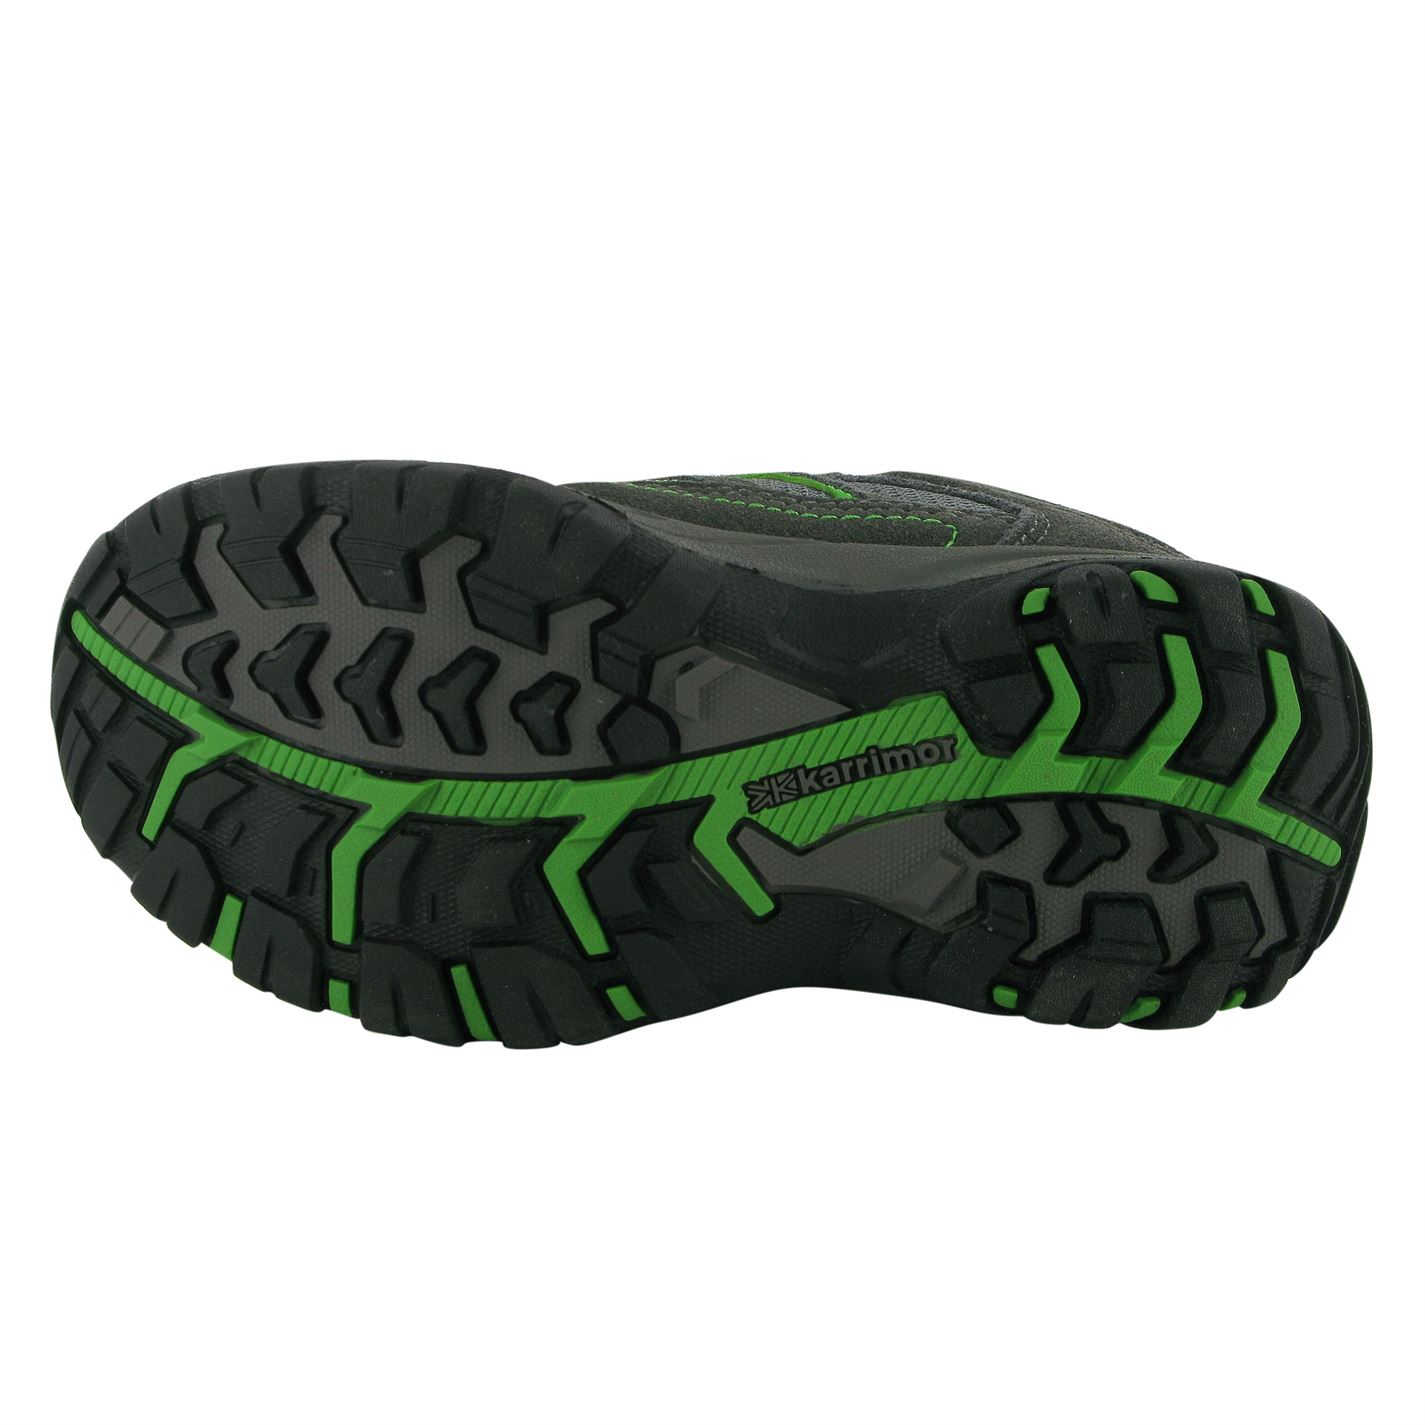 Karrimor Kids Mount Low Childrens Walking Shoes Boys Trekking Hiking Lace Up